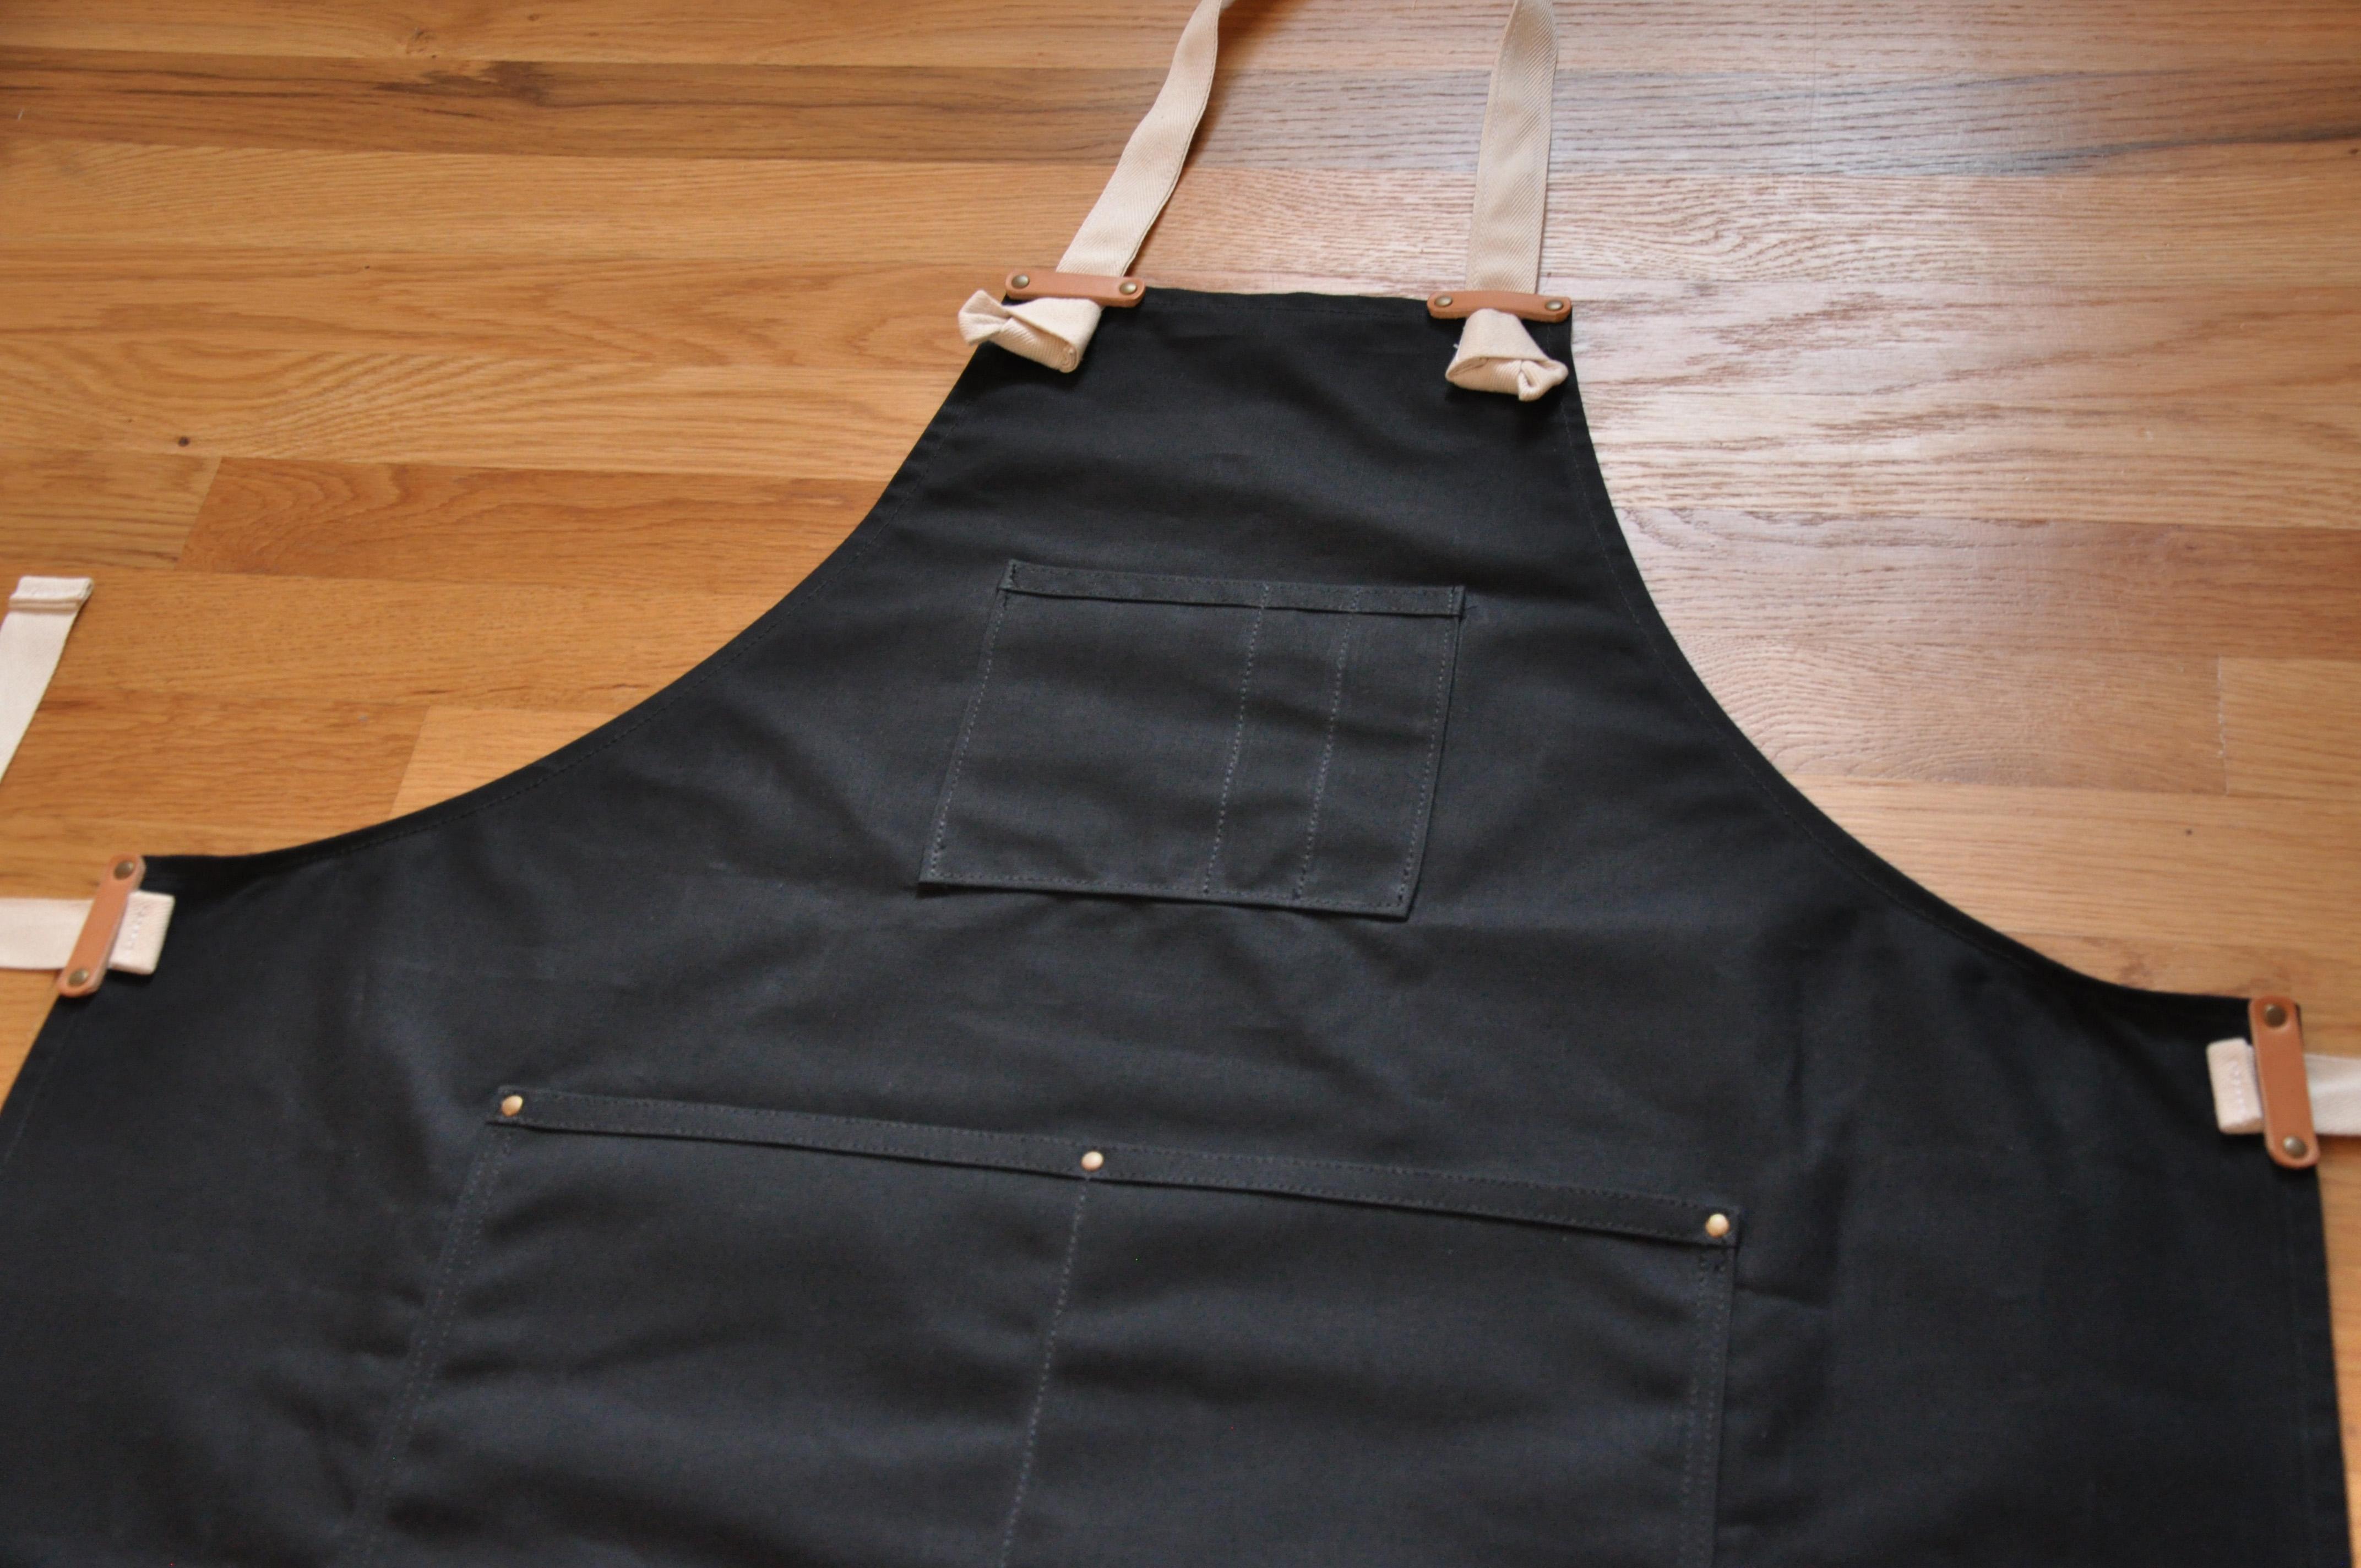 Black apron -  Apron Black Waxed Canvas Thumbnail 2